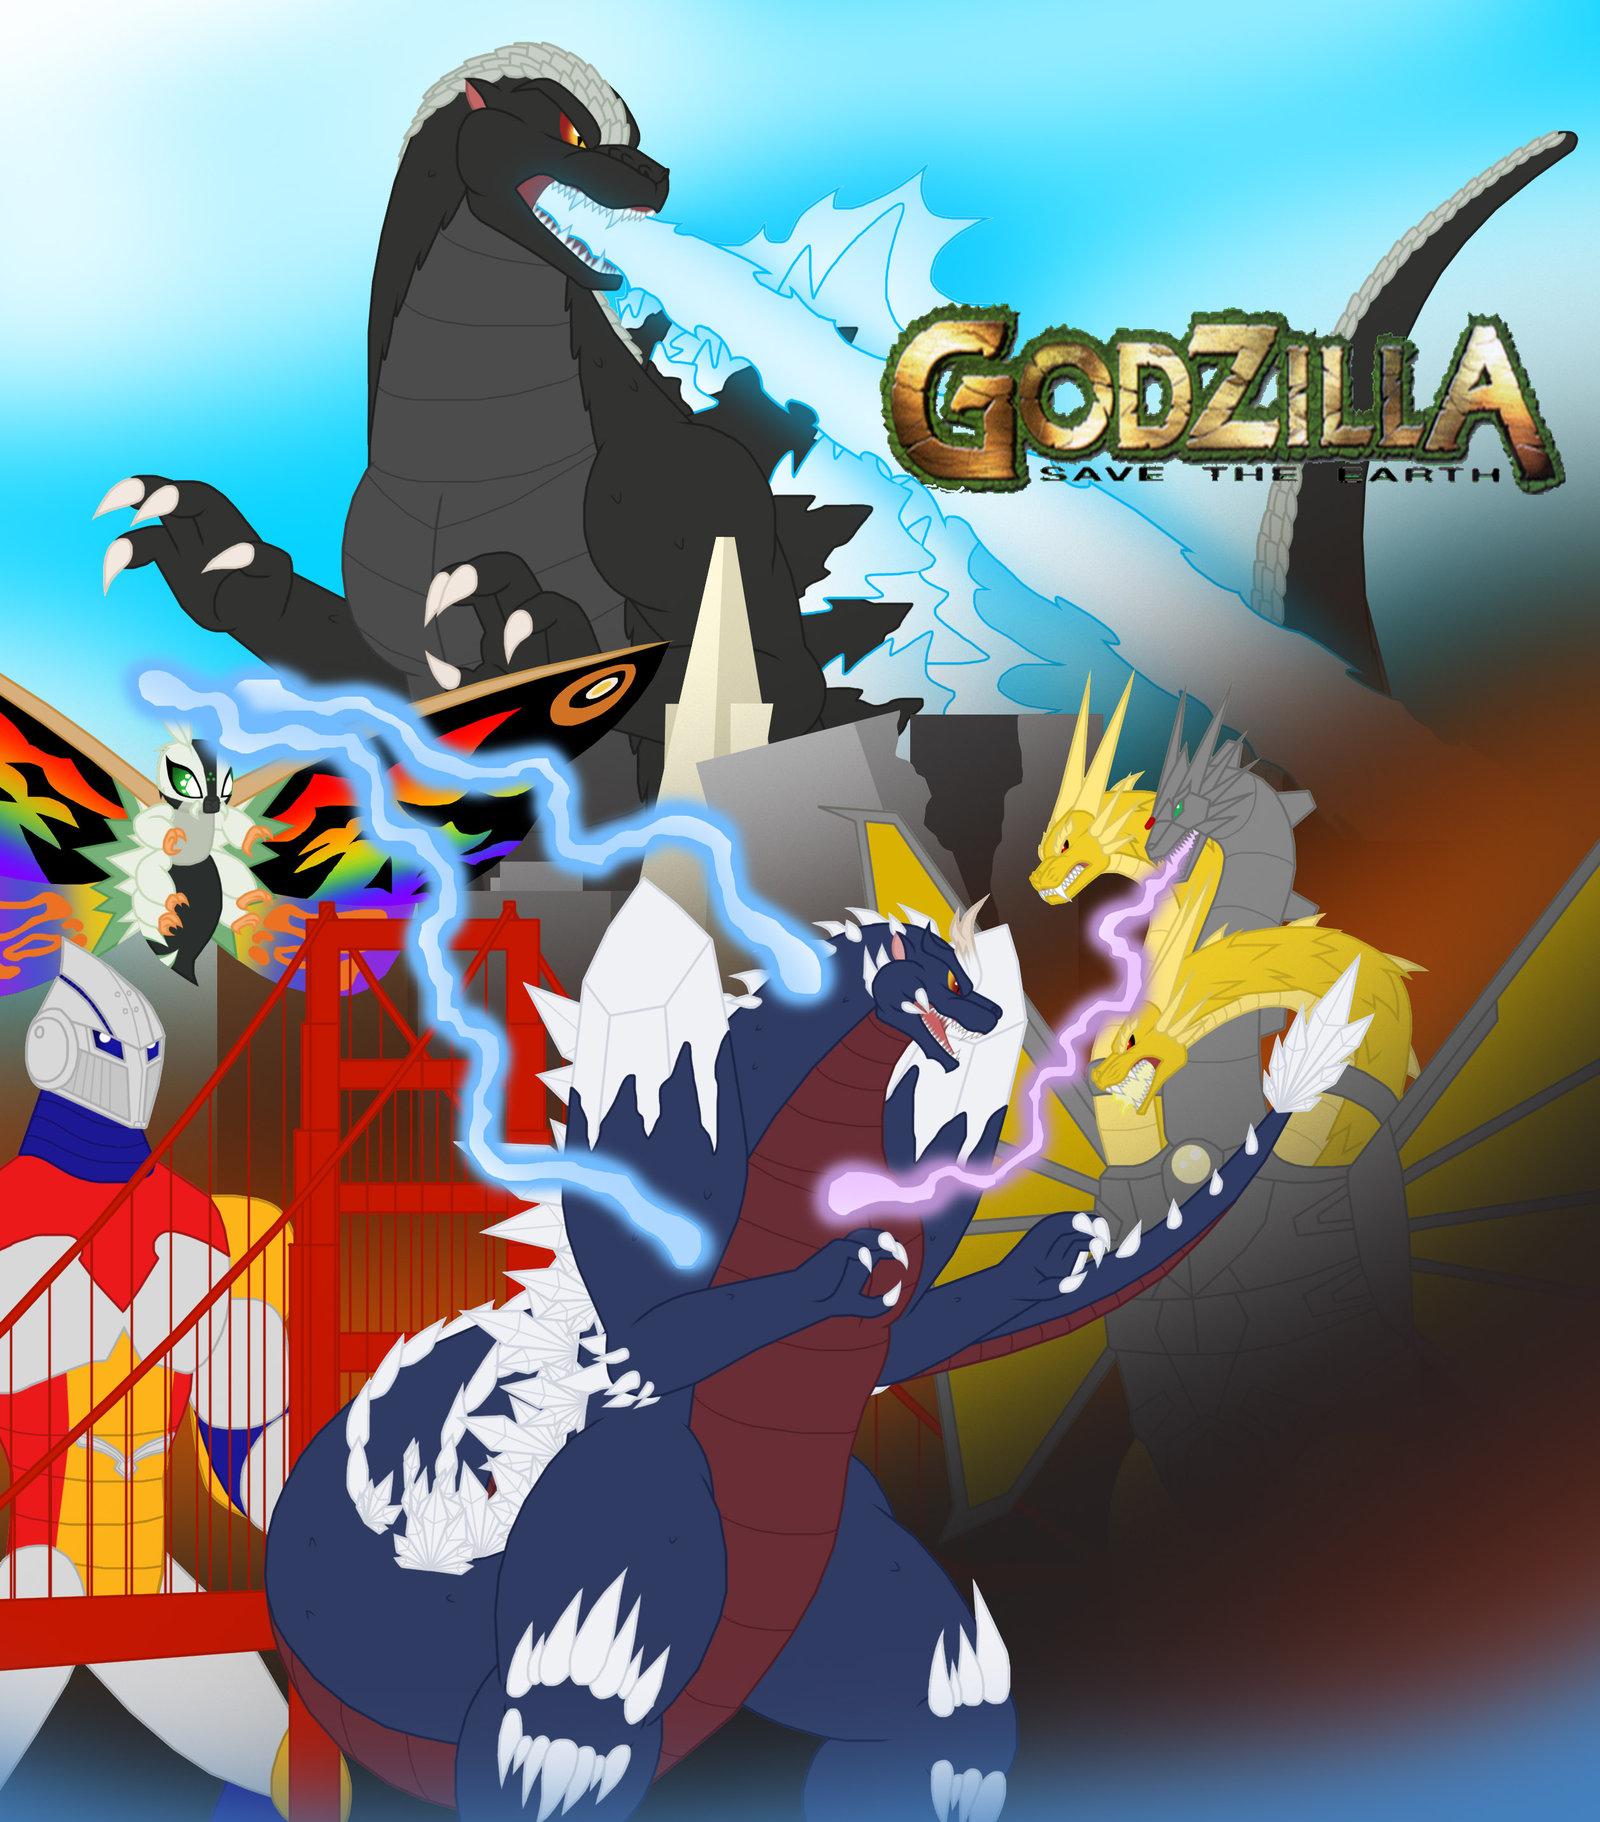 Godzilla Save the Earth The Bridge Style by Pyrus.